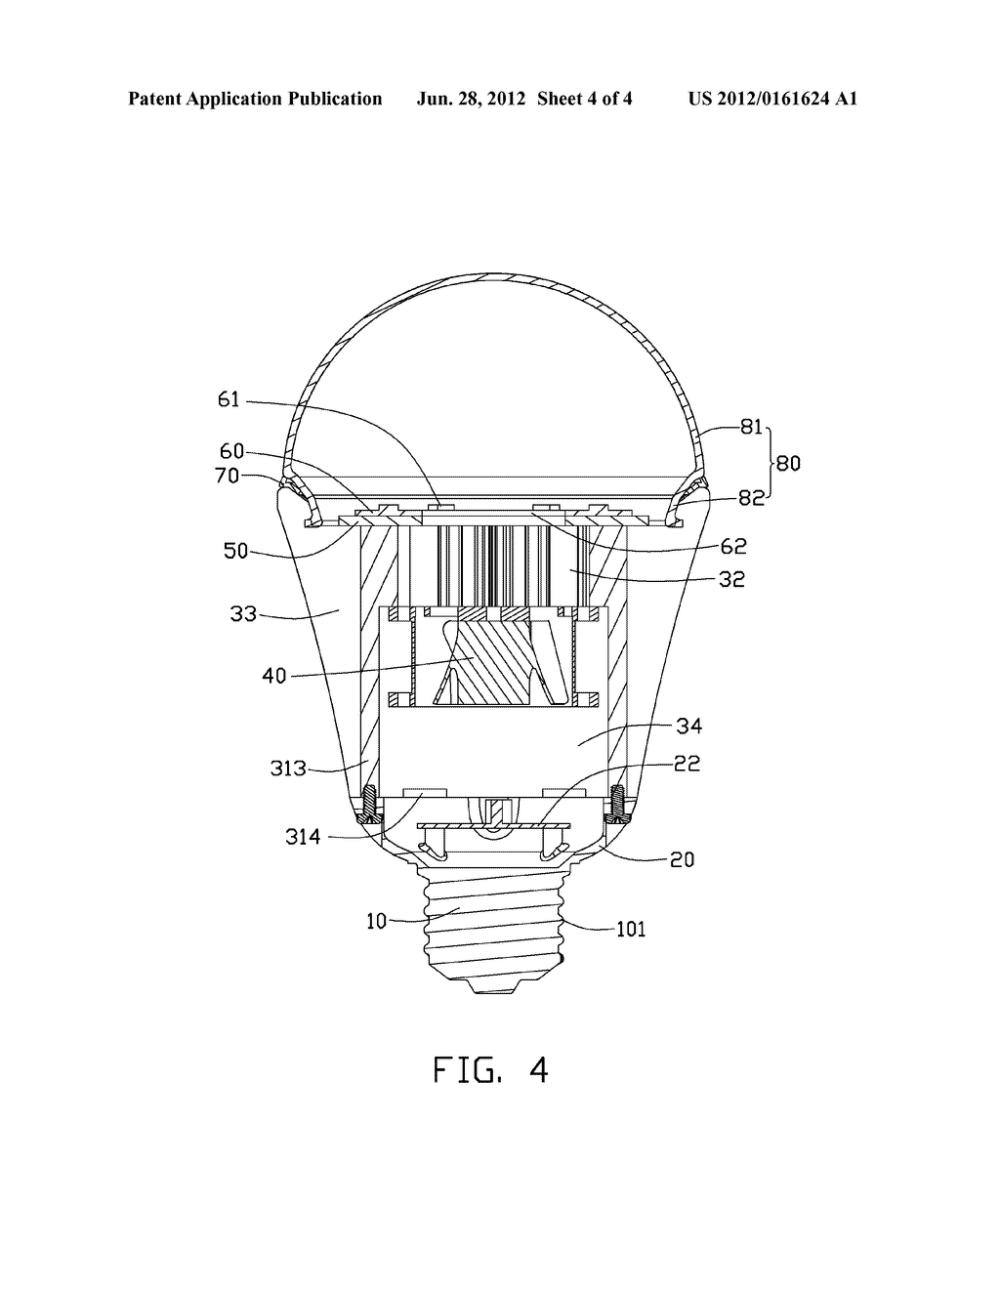 medium resolution of led bulb diagram wiring diagram schematics led dimmer schematic led bulb diagram schematic wiring diagrams energy